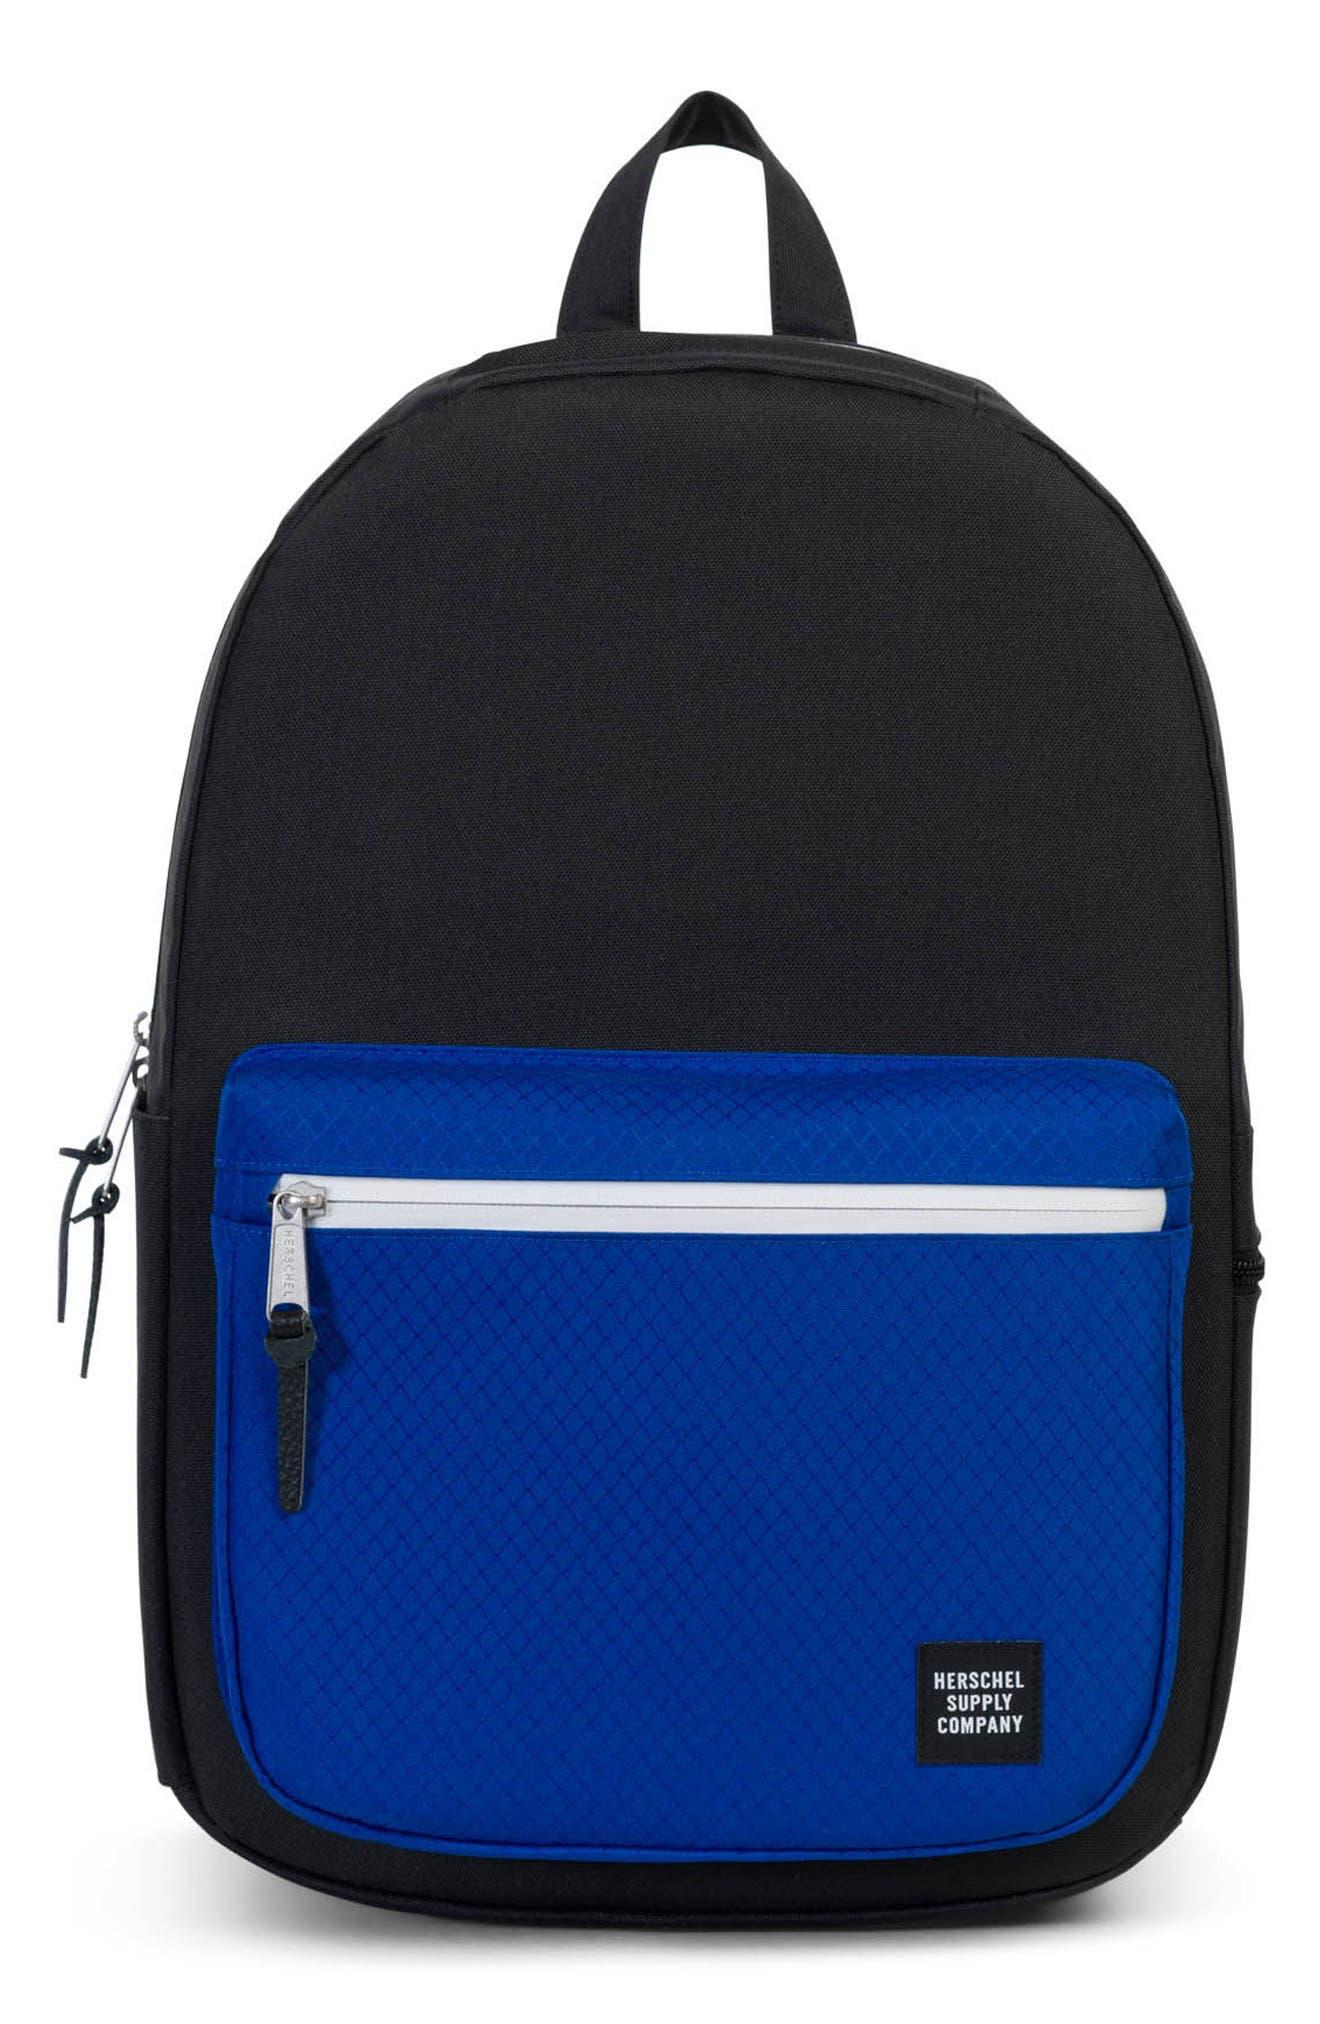 Alternate Image 1 Selected - Herschel Supply Co. Harrison Backpack